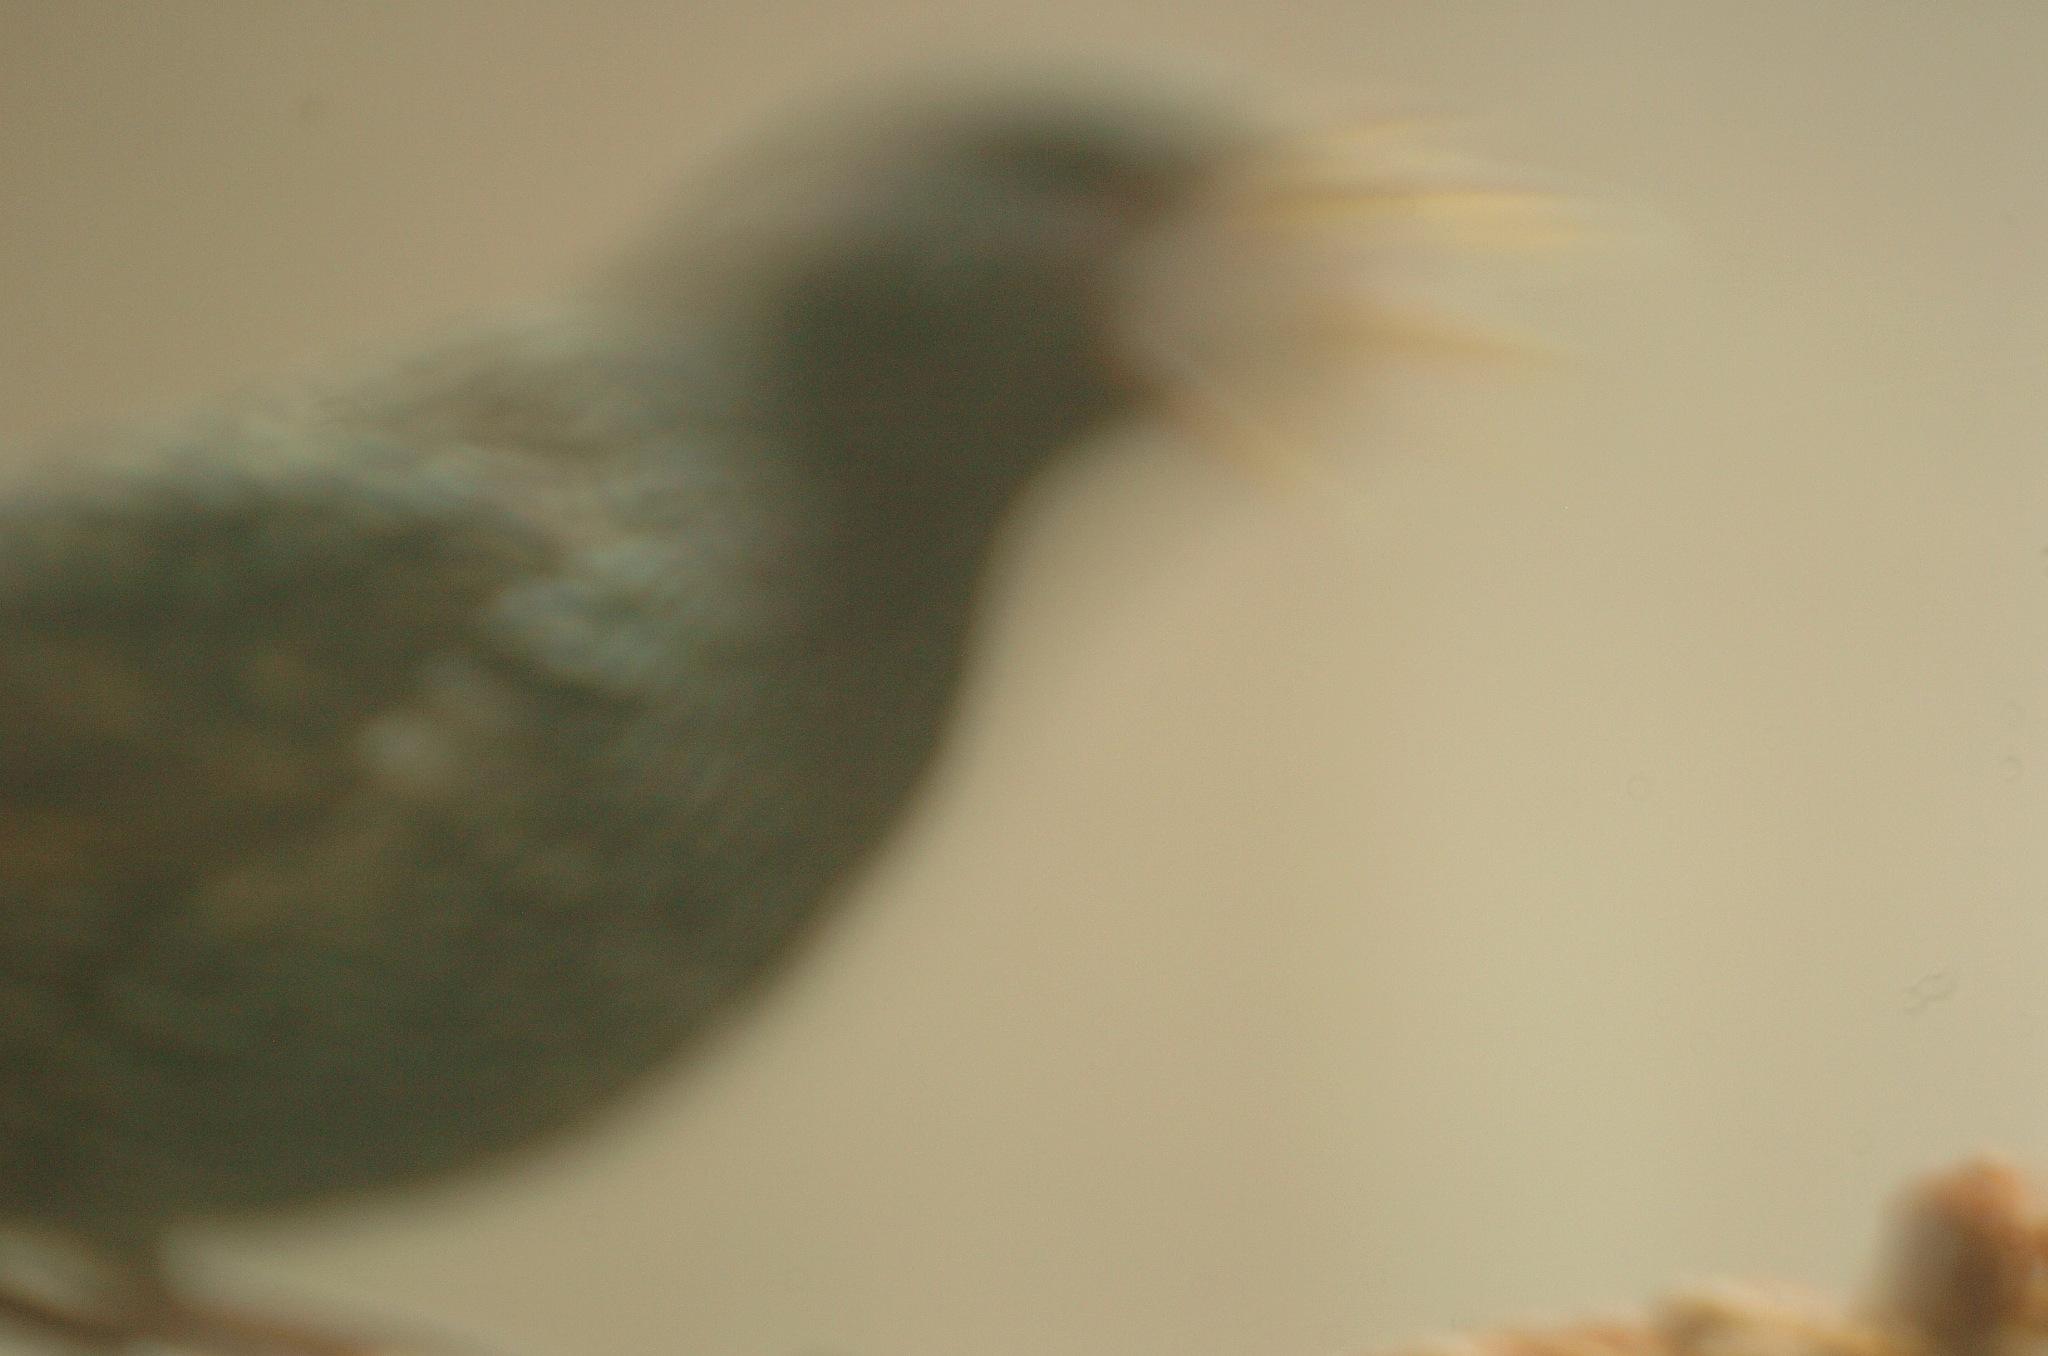 blurred -1 by Paul Tetloff